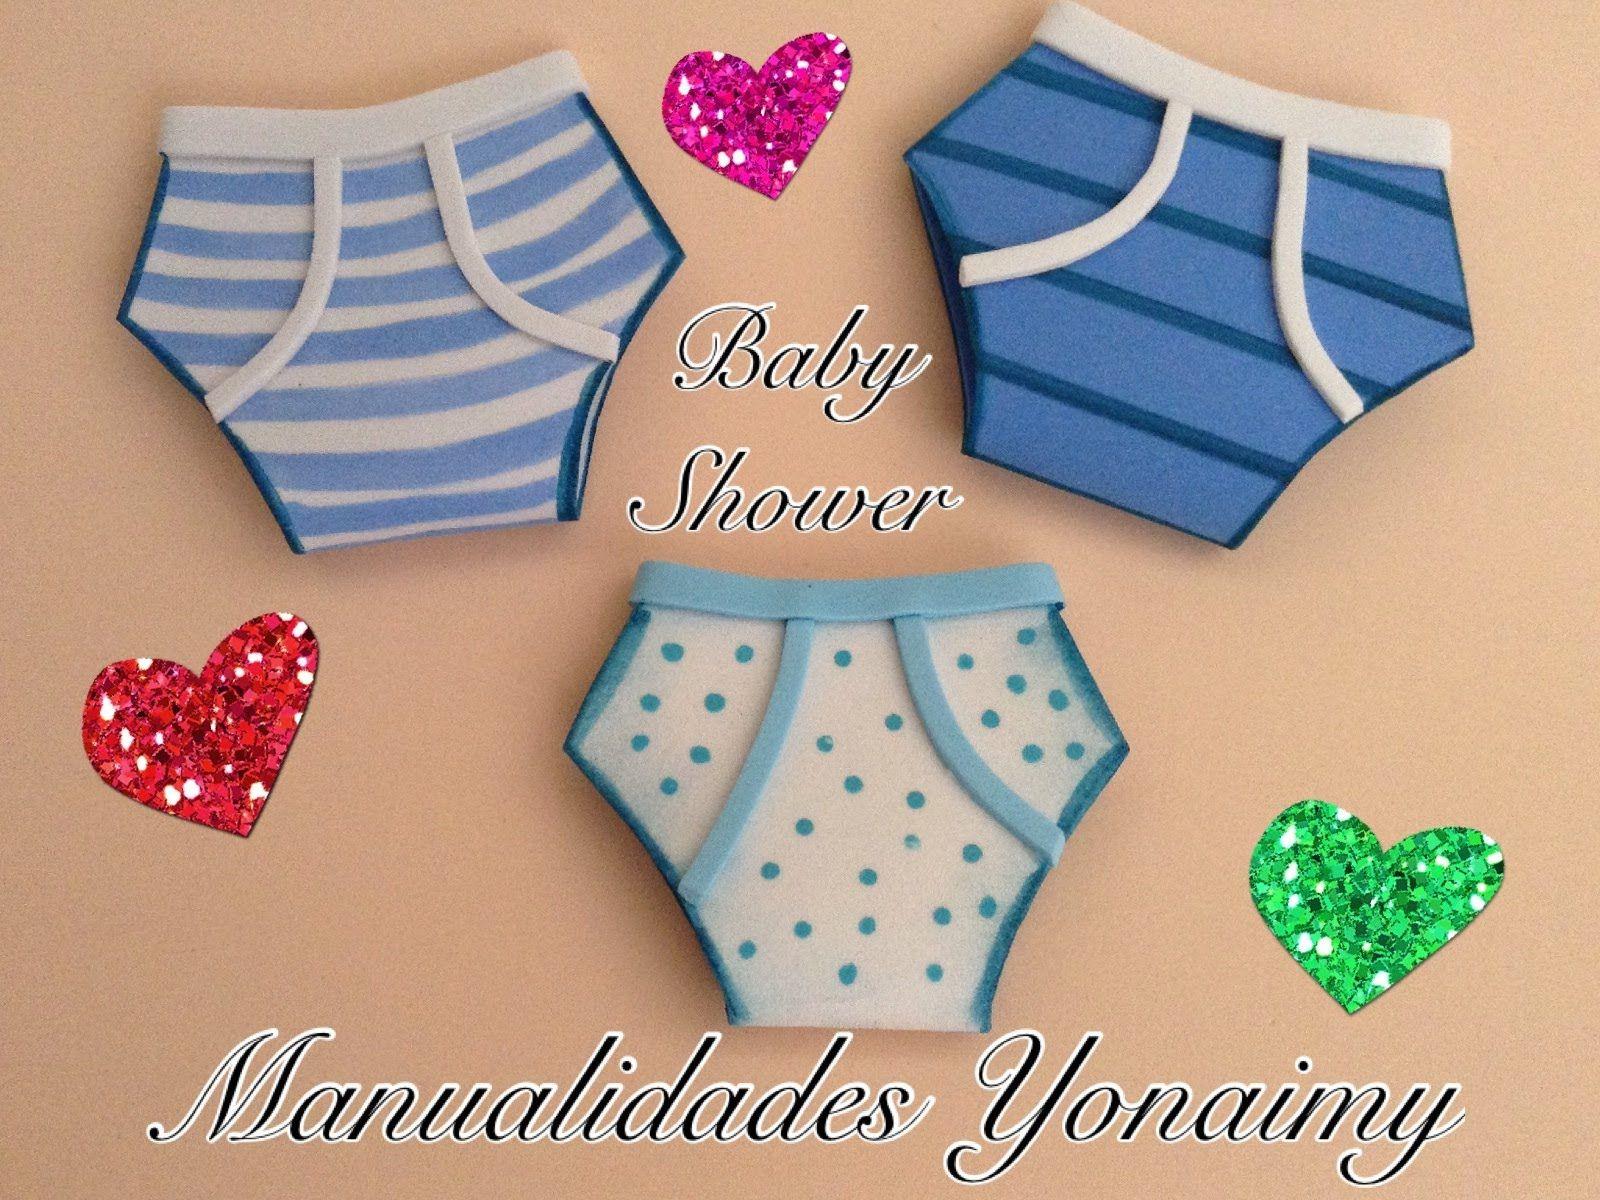 calzoncitos de nio para baby shower hechos con foamy o goma eva